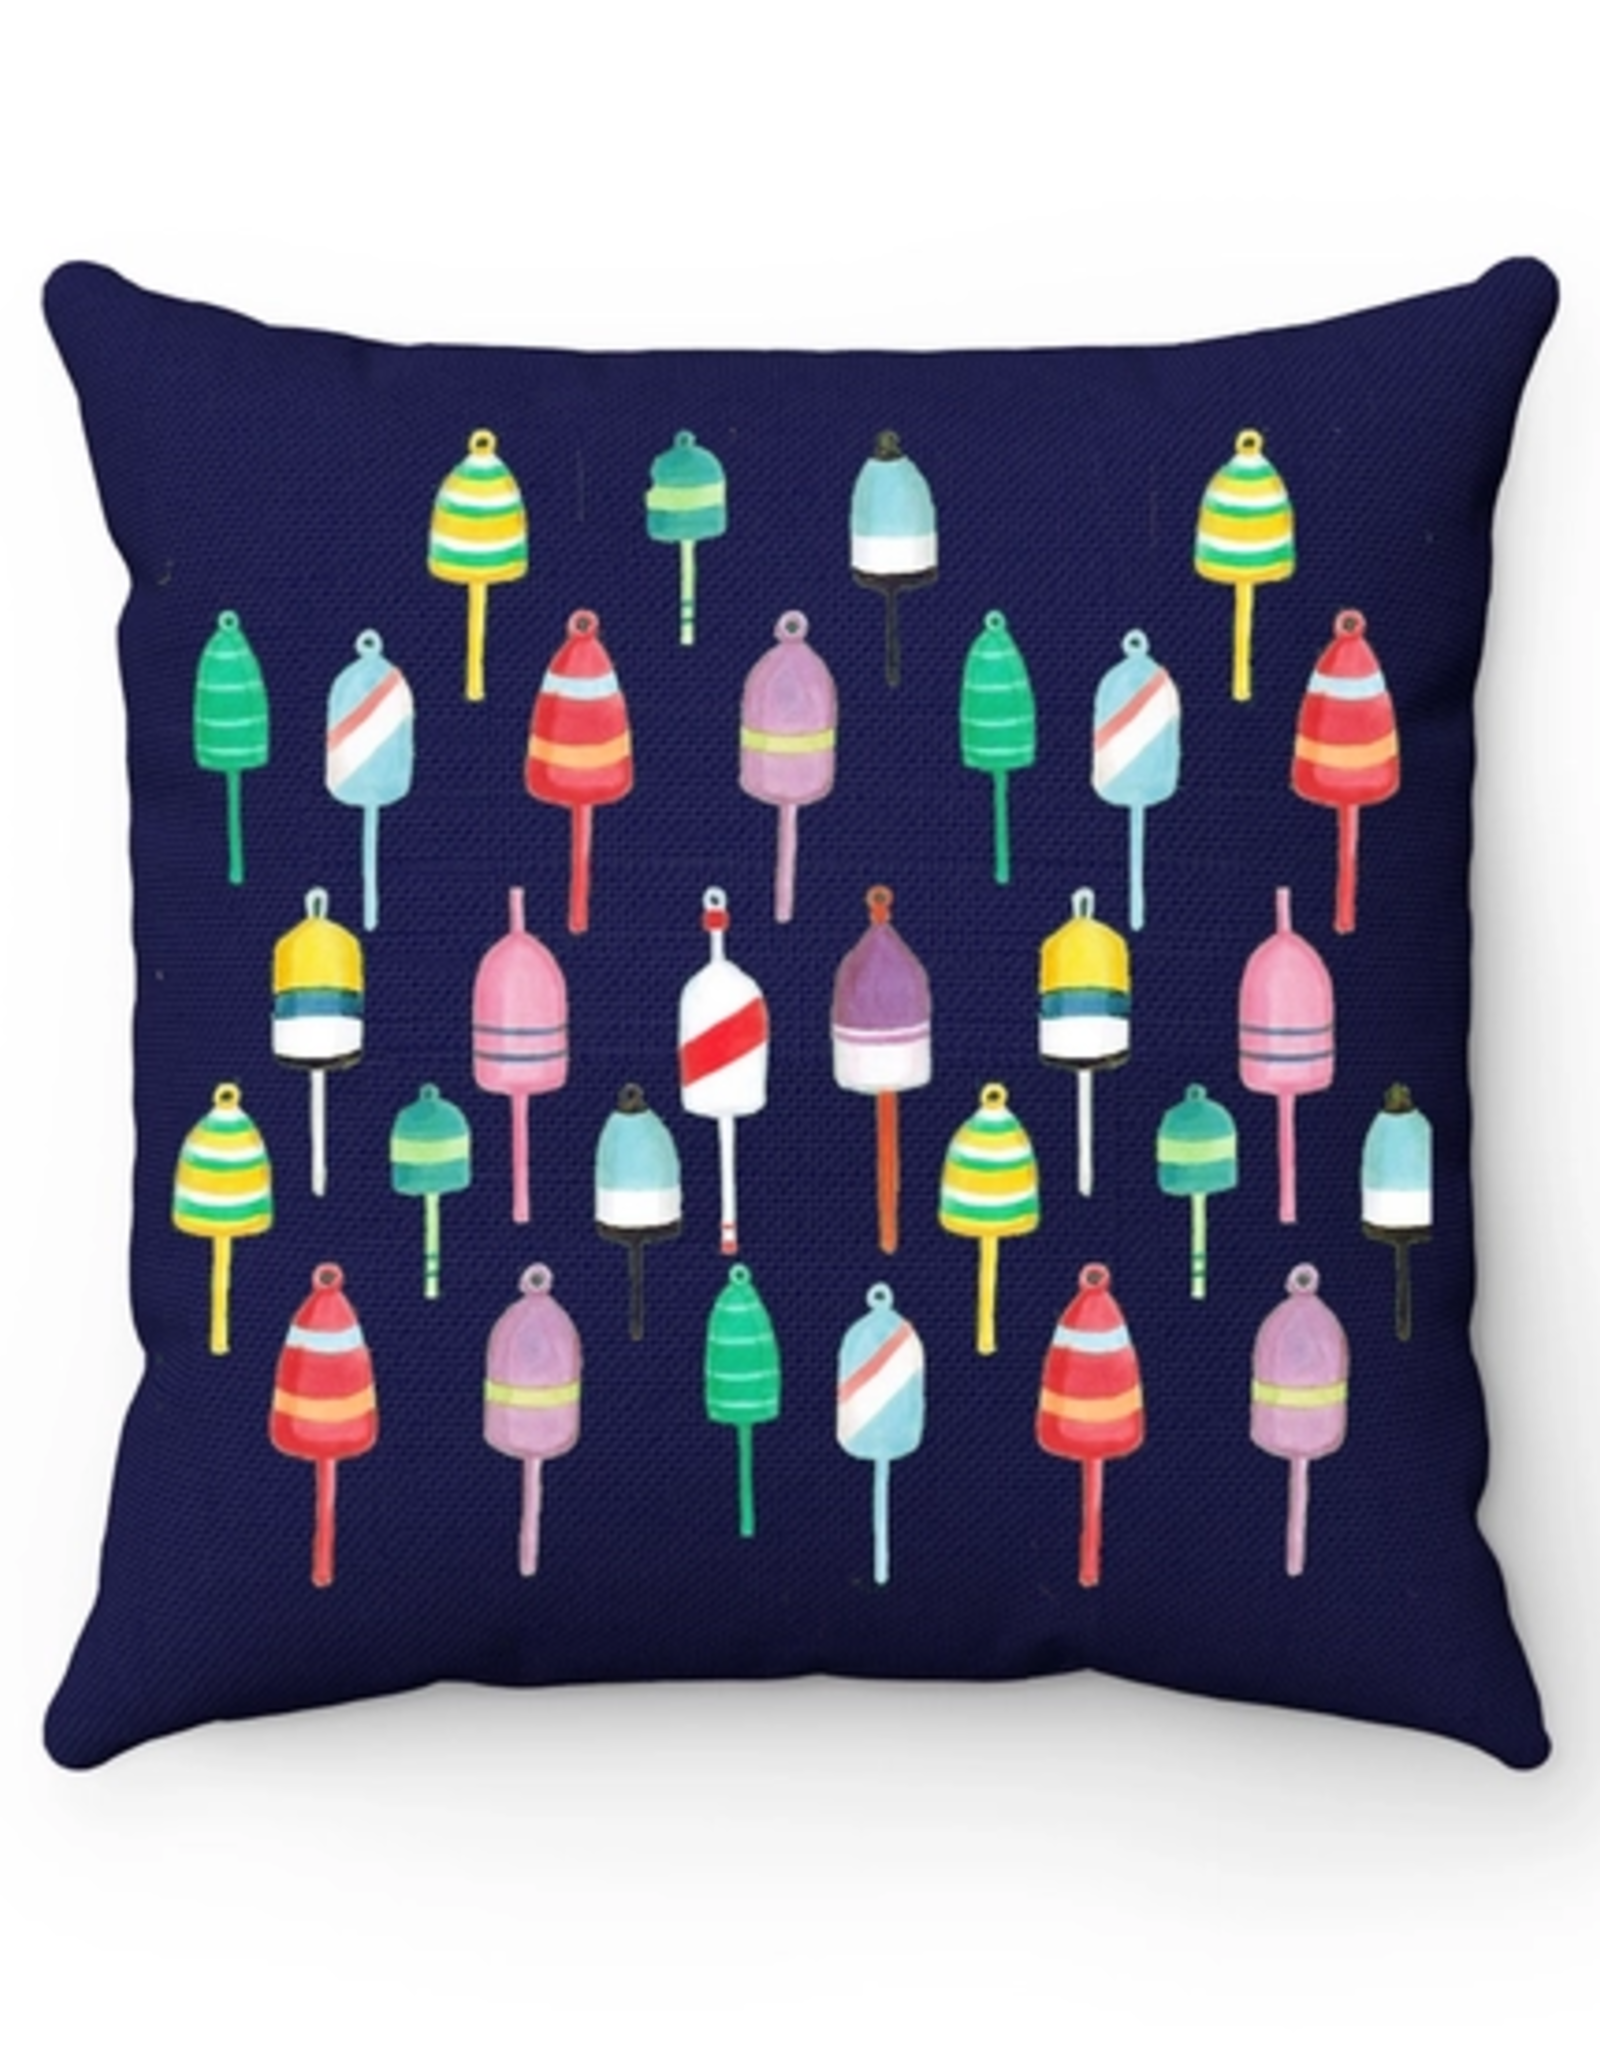 Peachy Pendants Pillow, Buoys